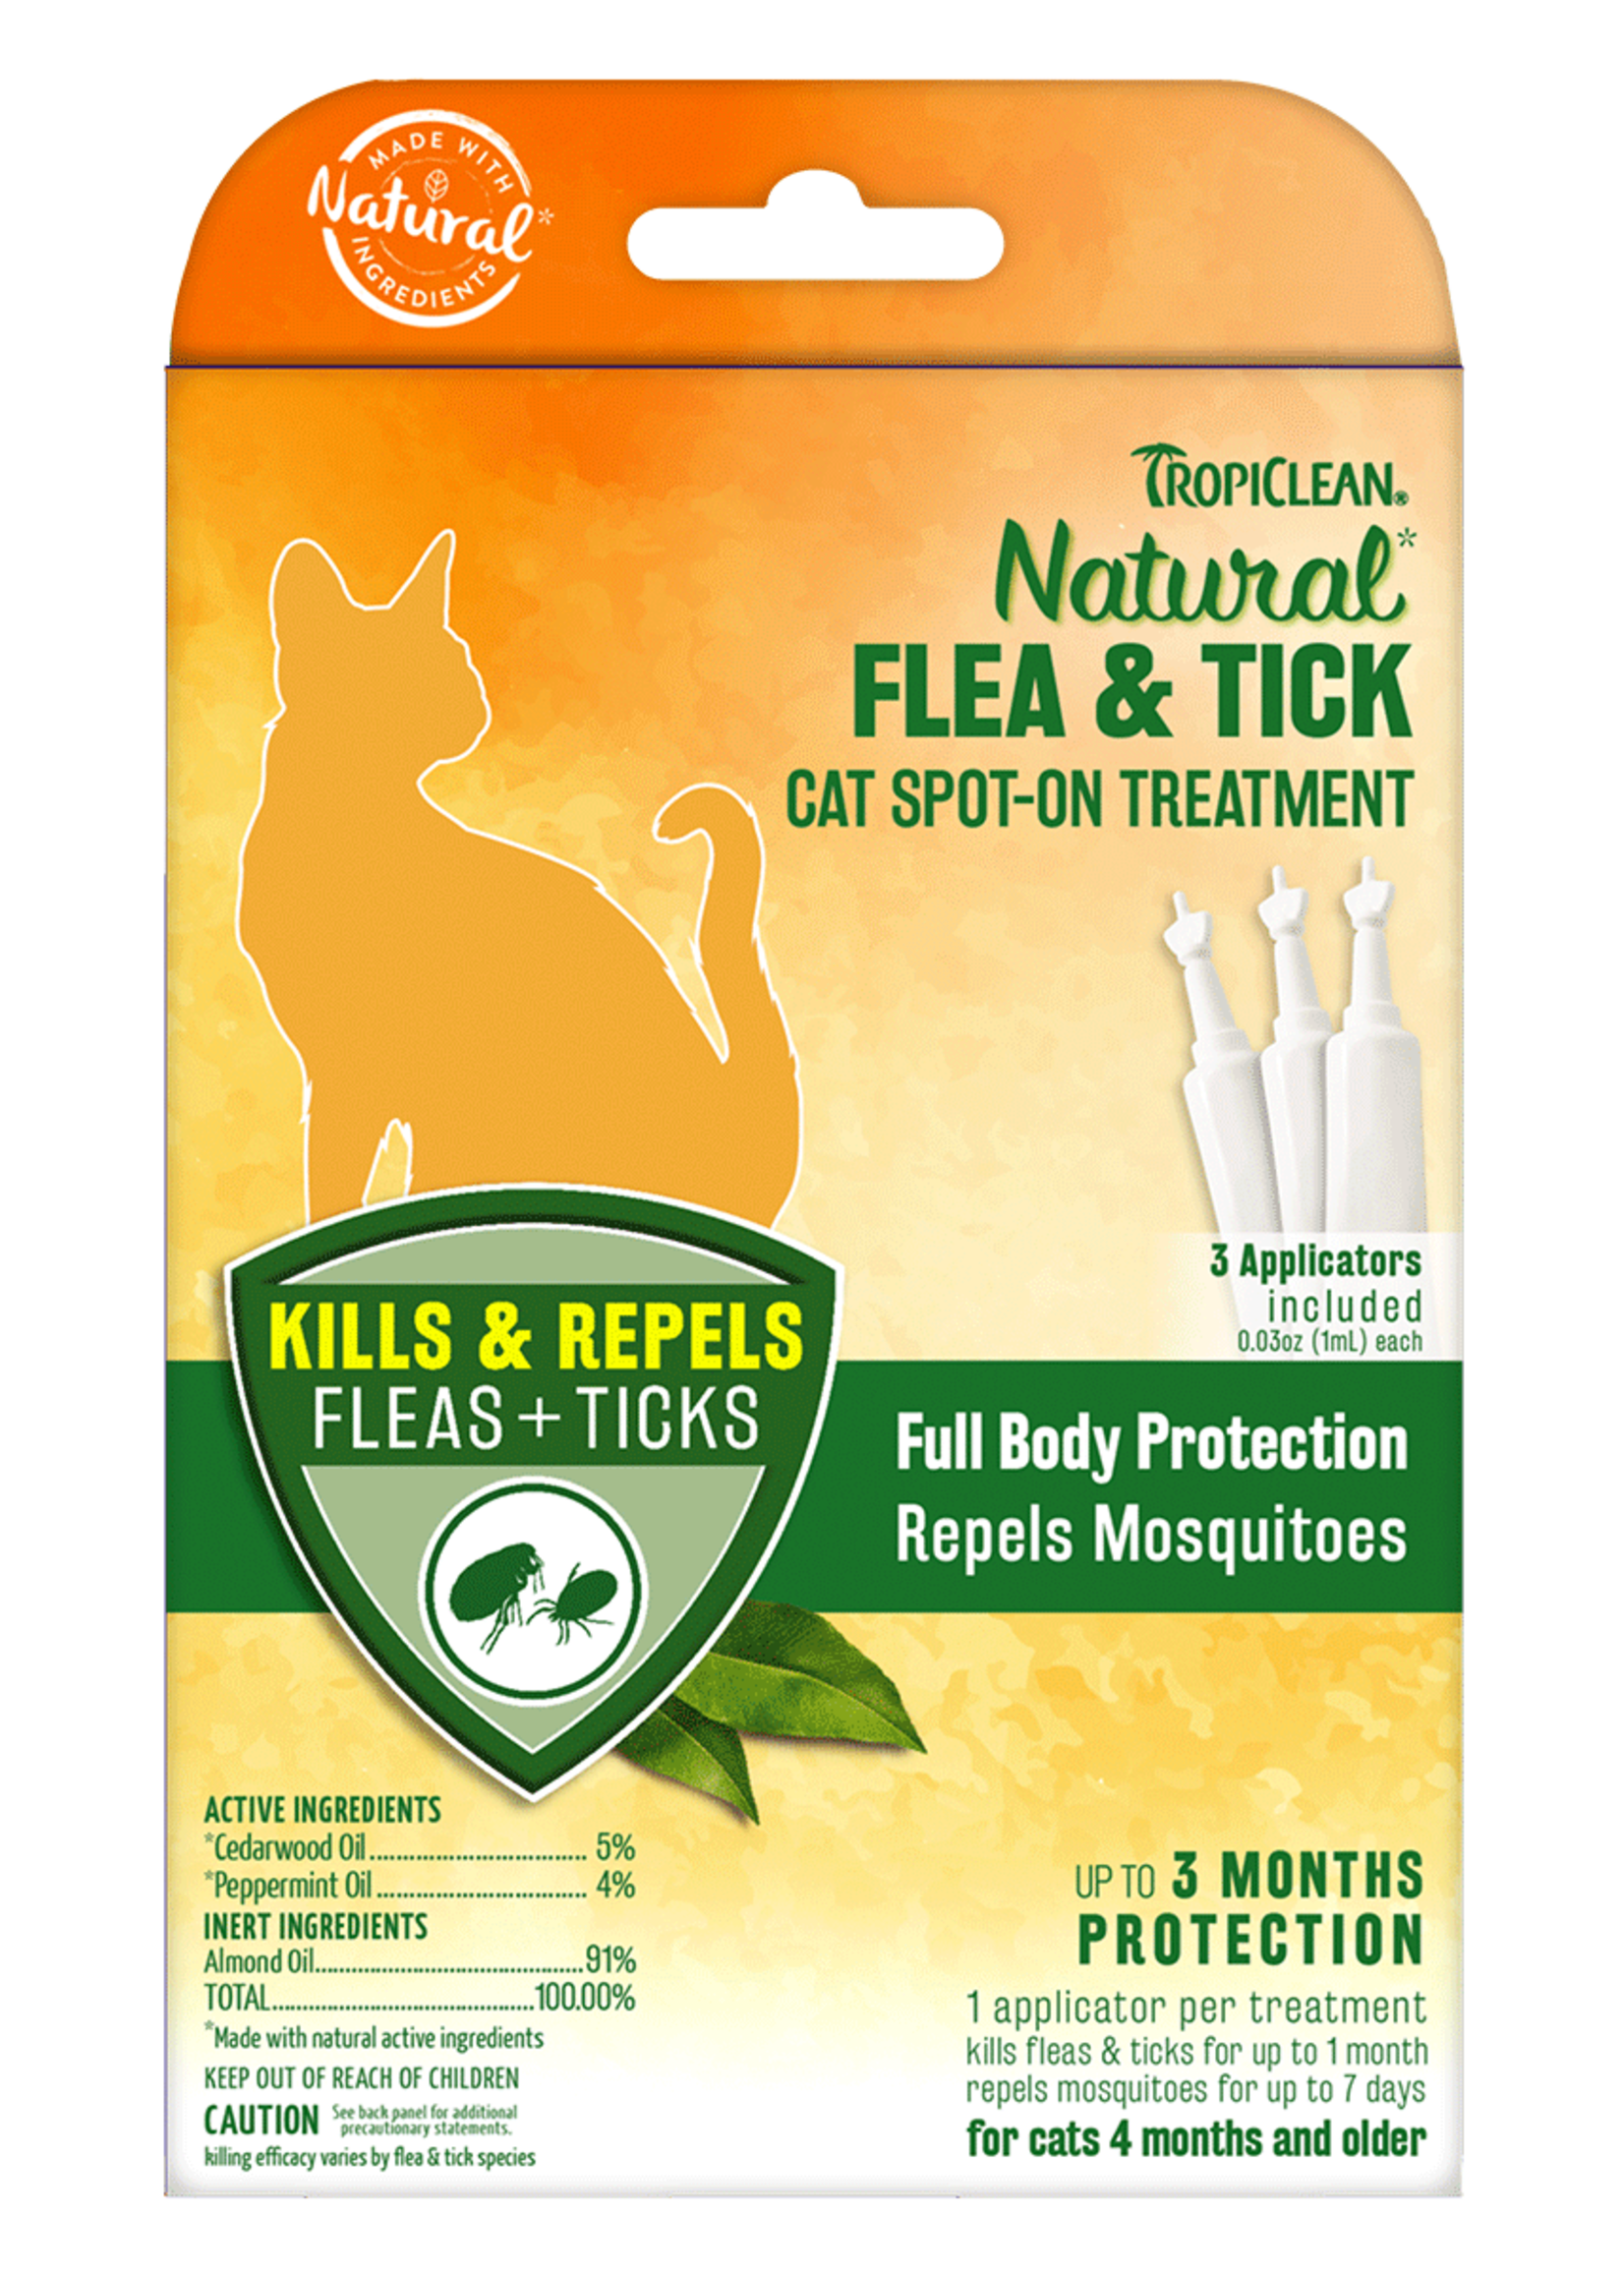 TropiClean TropiClean Cat Flea & Tick Spot-On Treatment